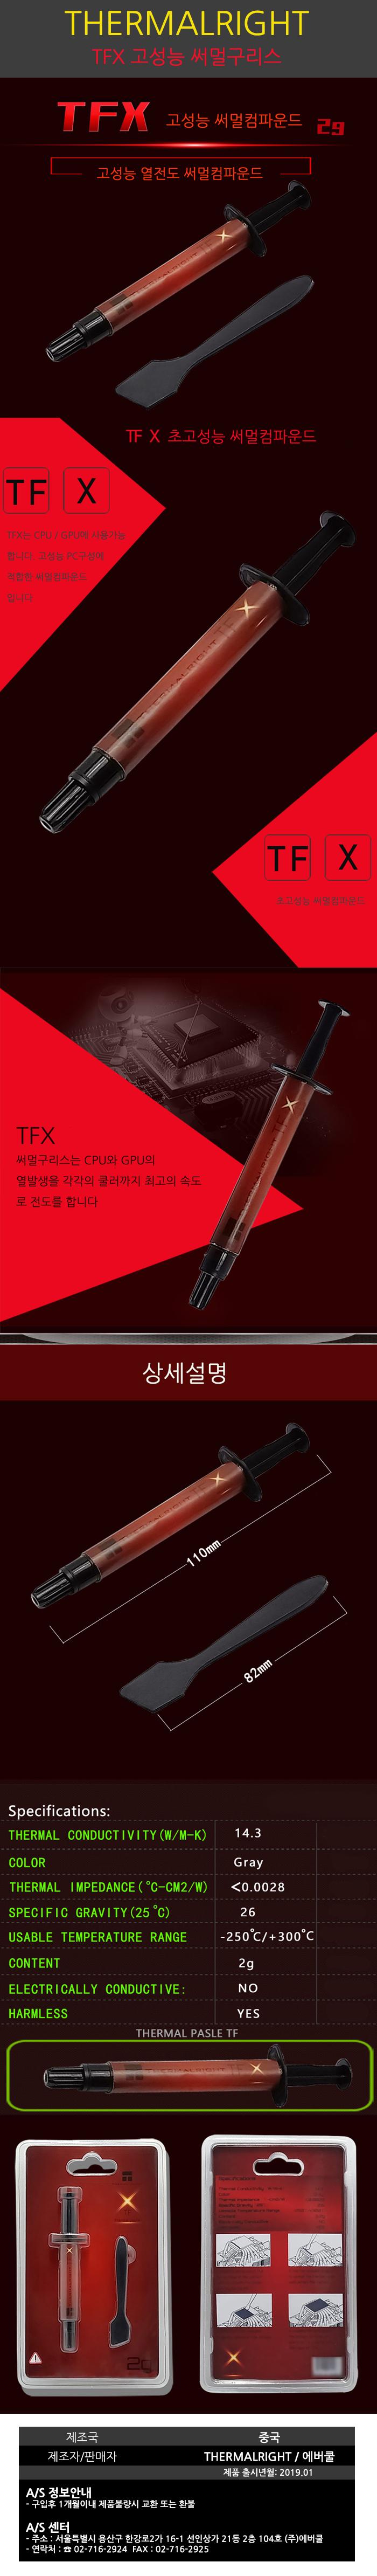 Thermalright TFX 병행수입 (2g)